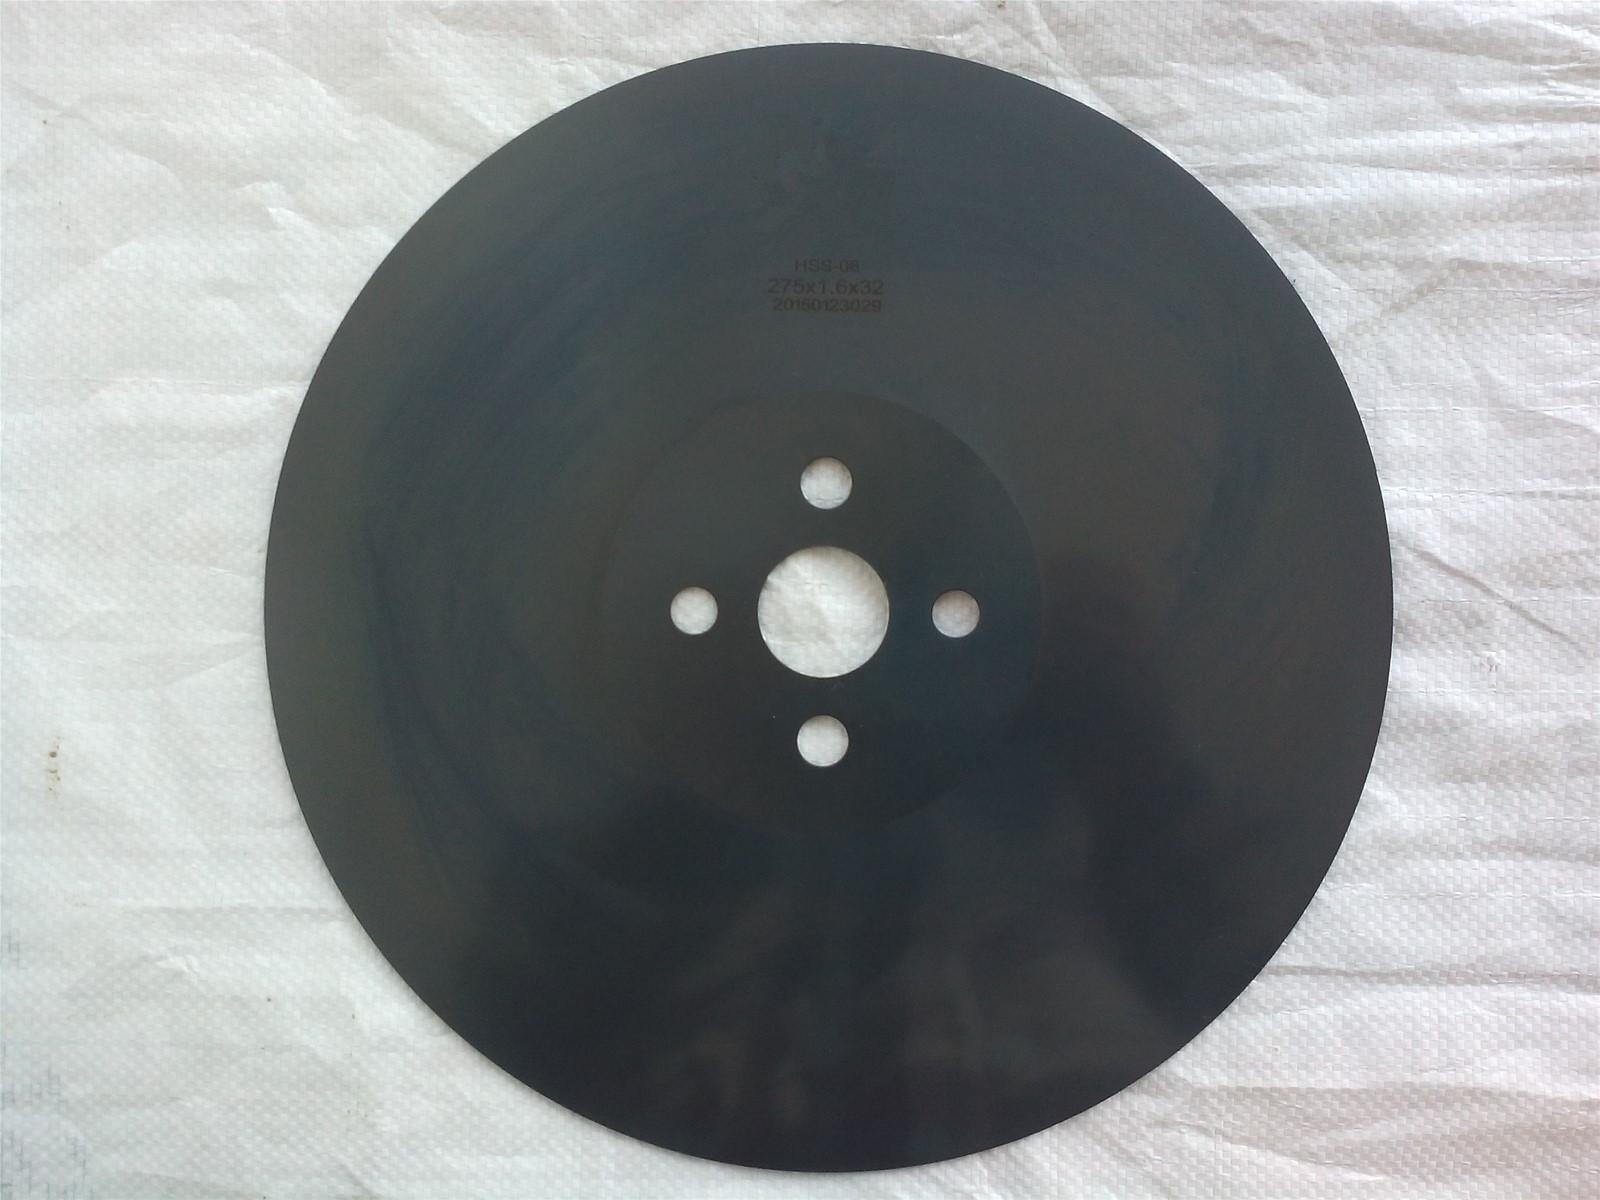 Dmo5 metal cutting VAPO cold circular saw blade